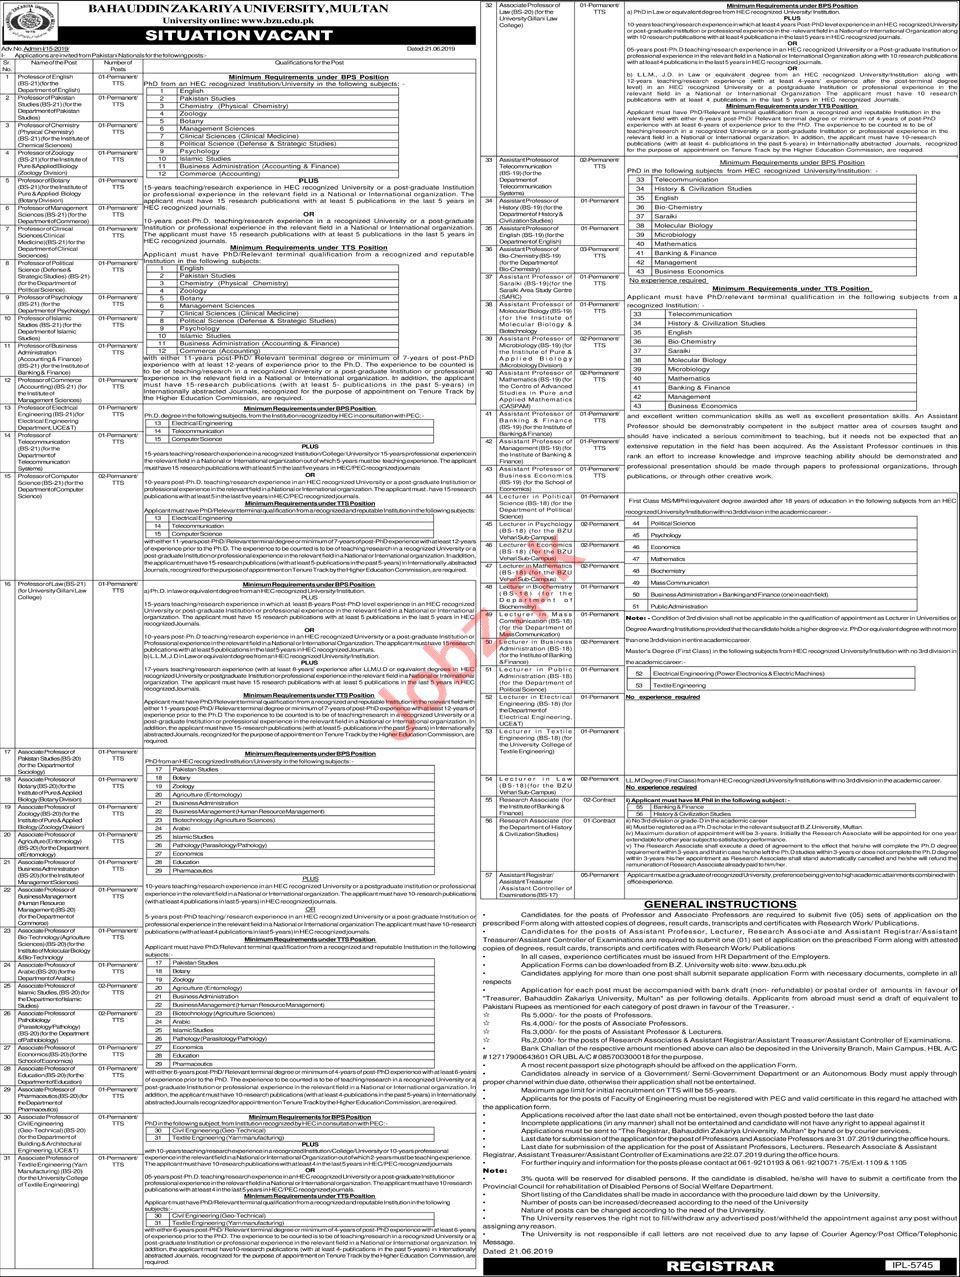 Bahauddin Zakariya University Multan BZU Jobs 2019